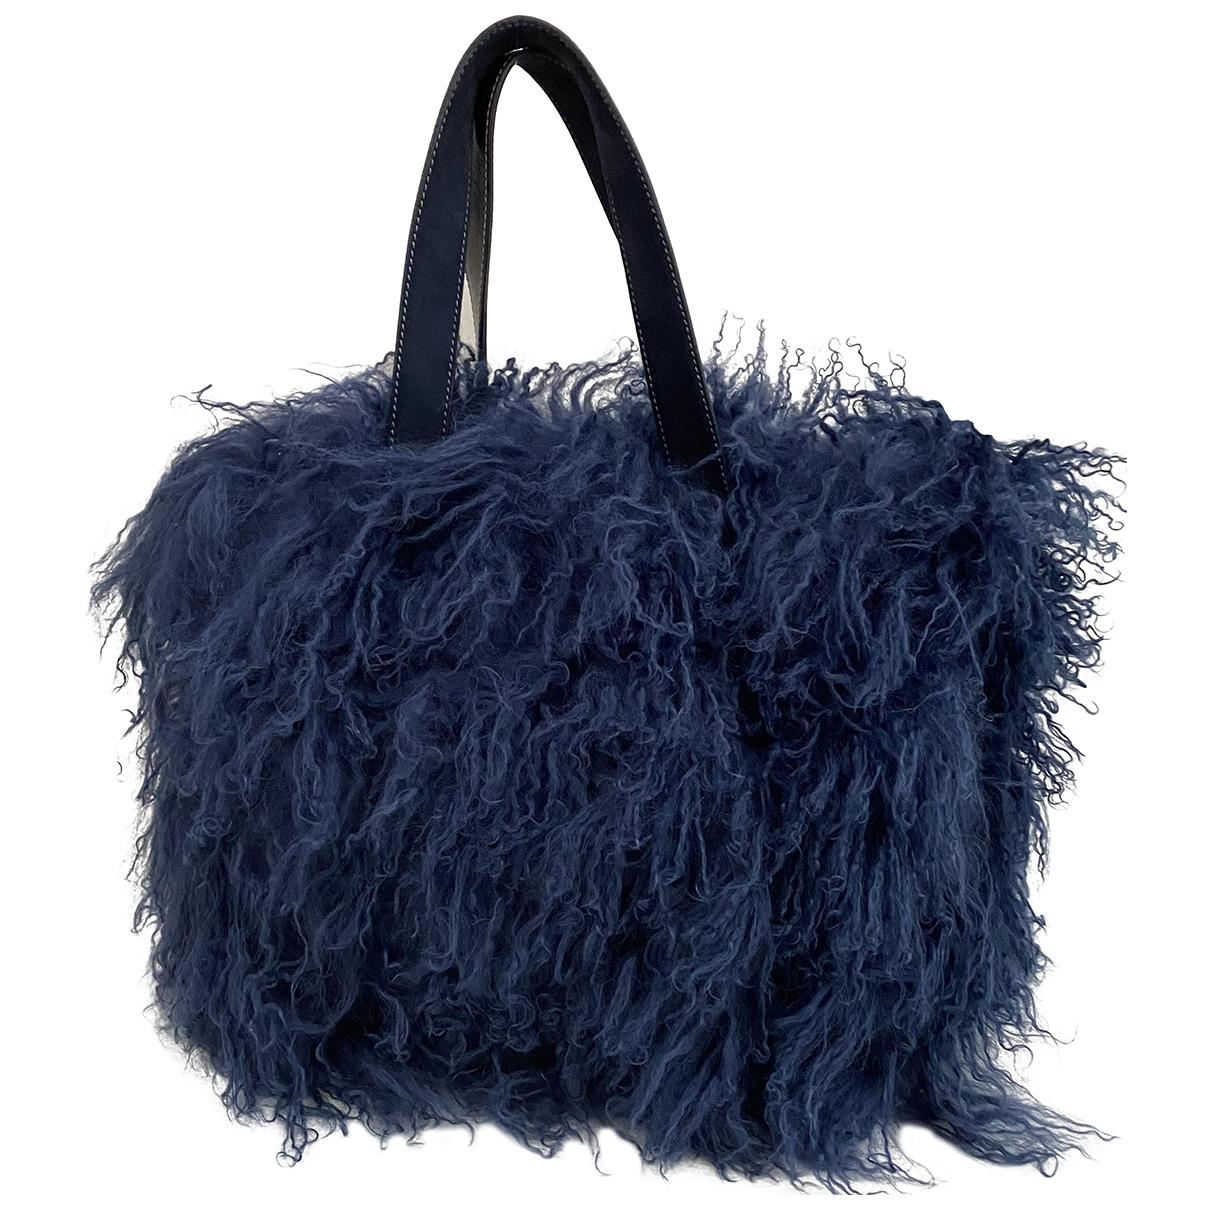 Hogan \N Handtasche in  Blau Synthetikpelz